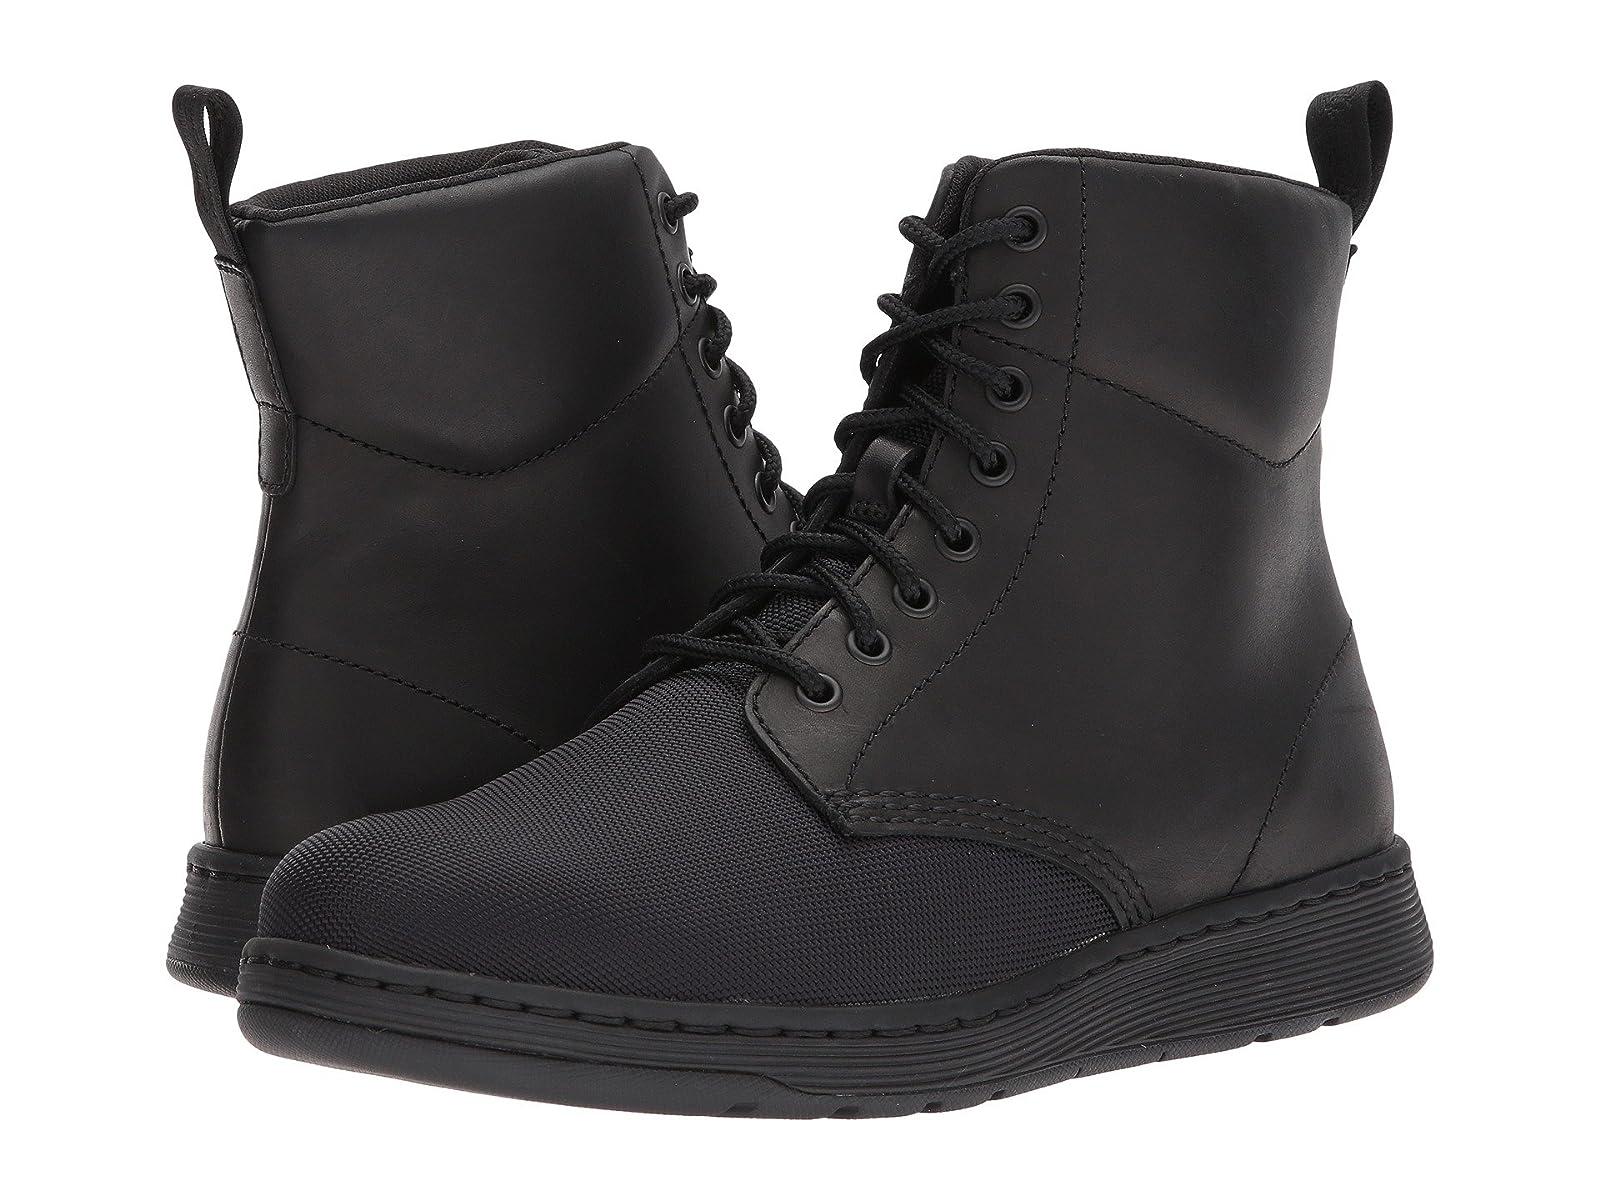 Dr. Martens Mono Rigal CorduraCheap and distinctive eye-catching shoes